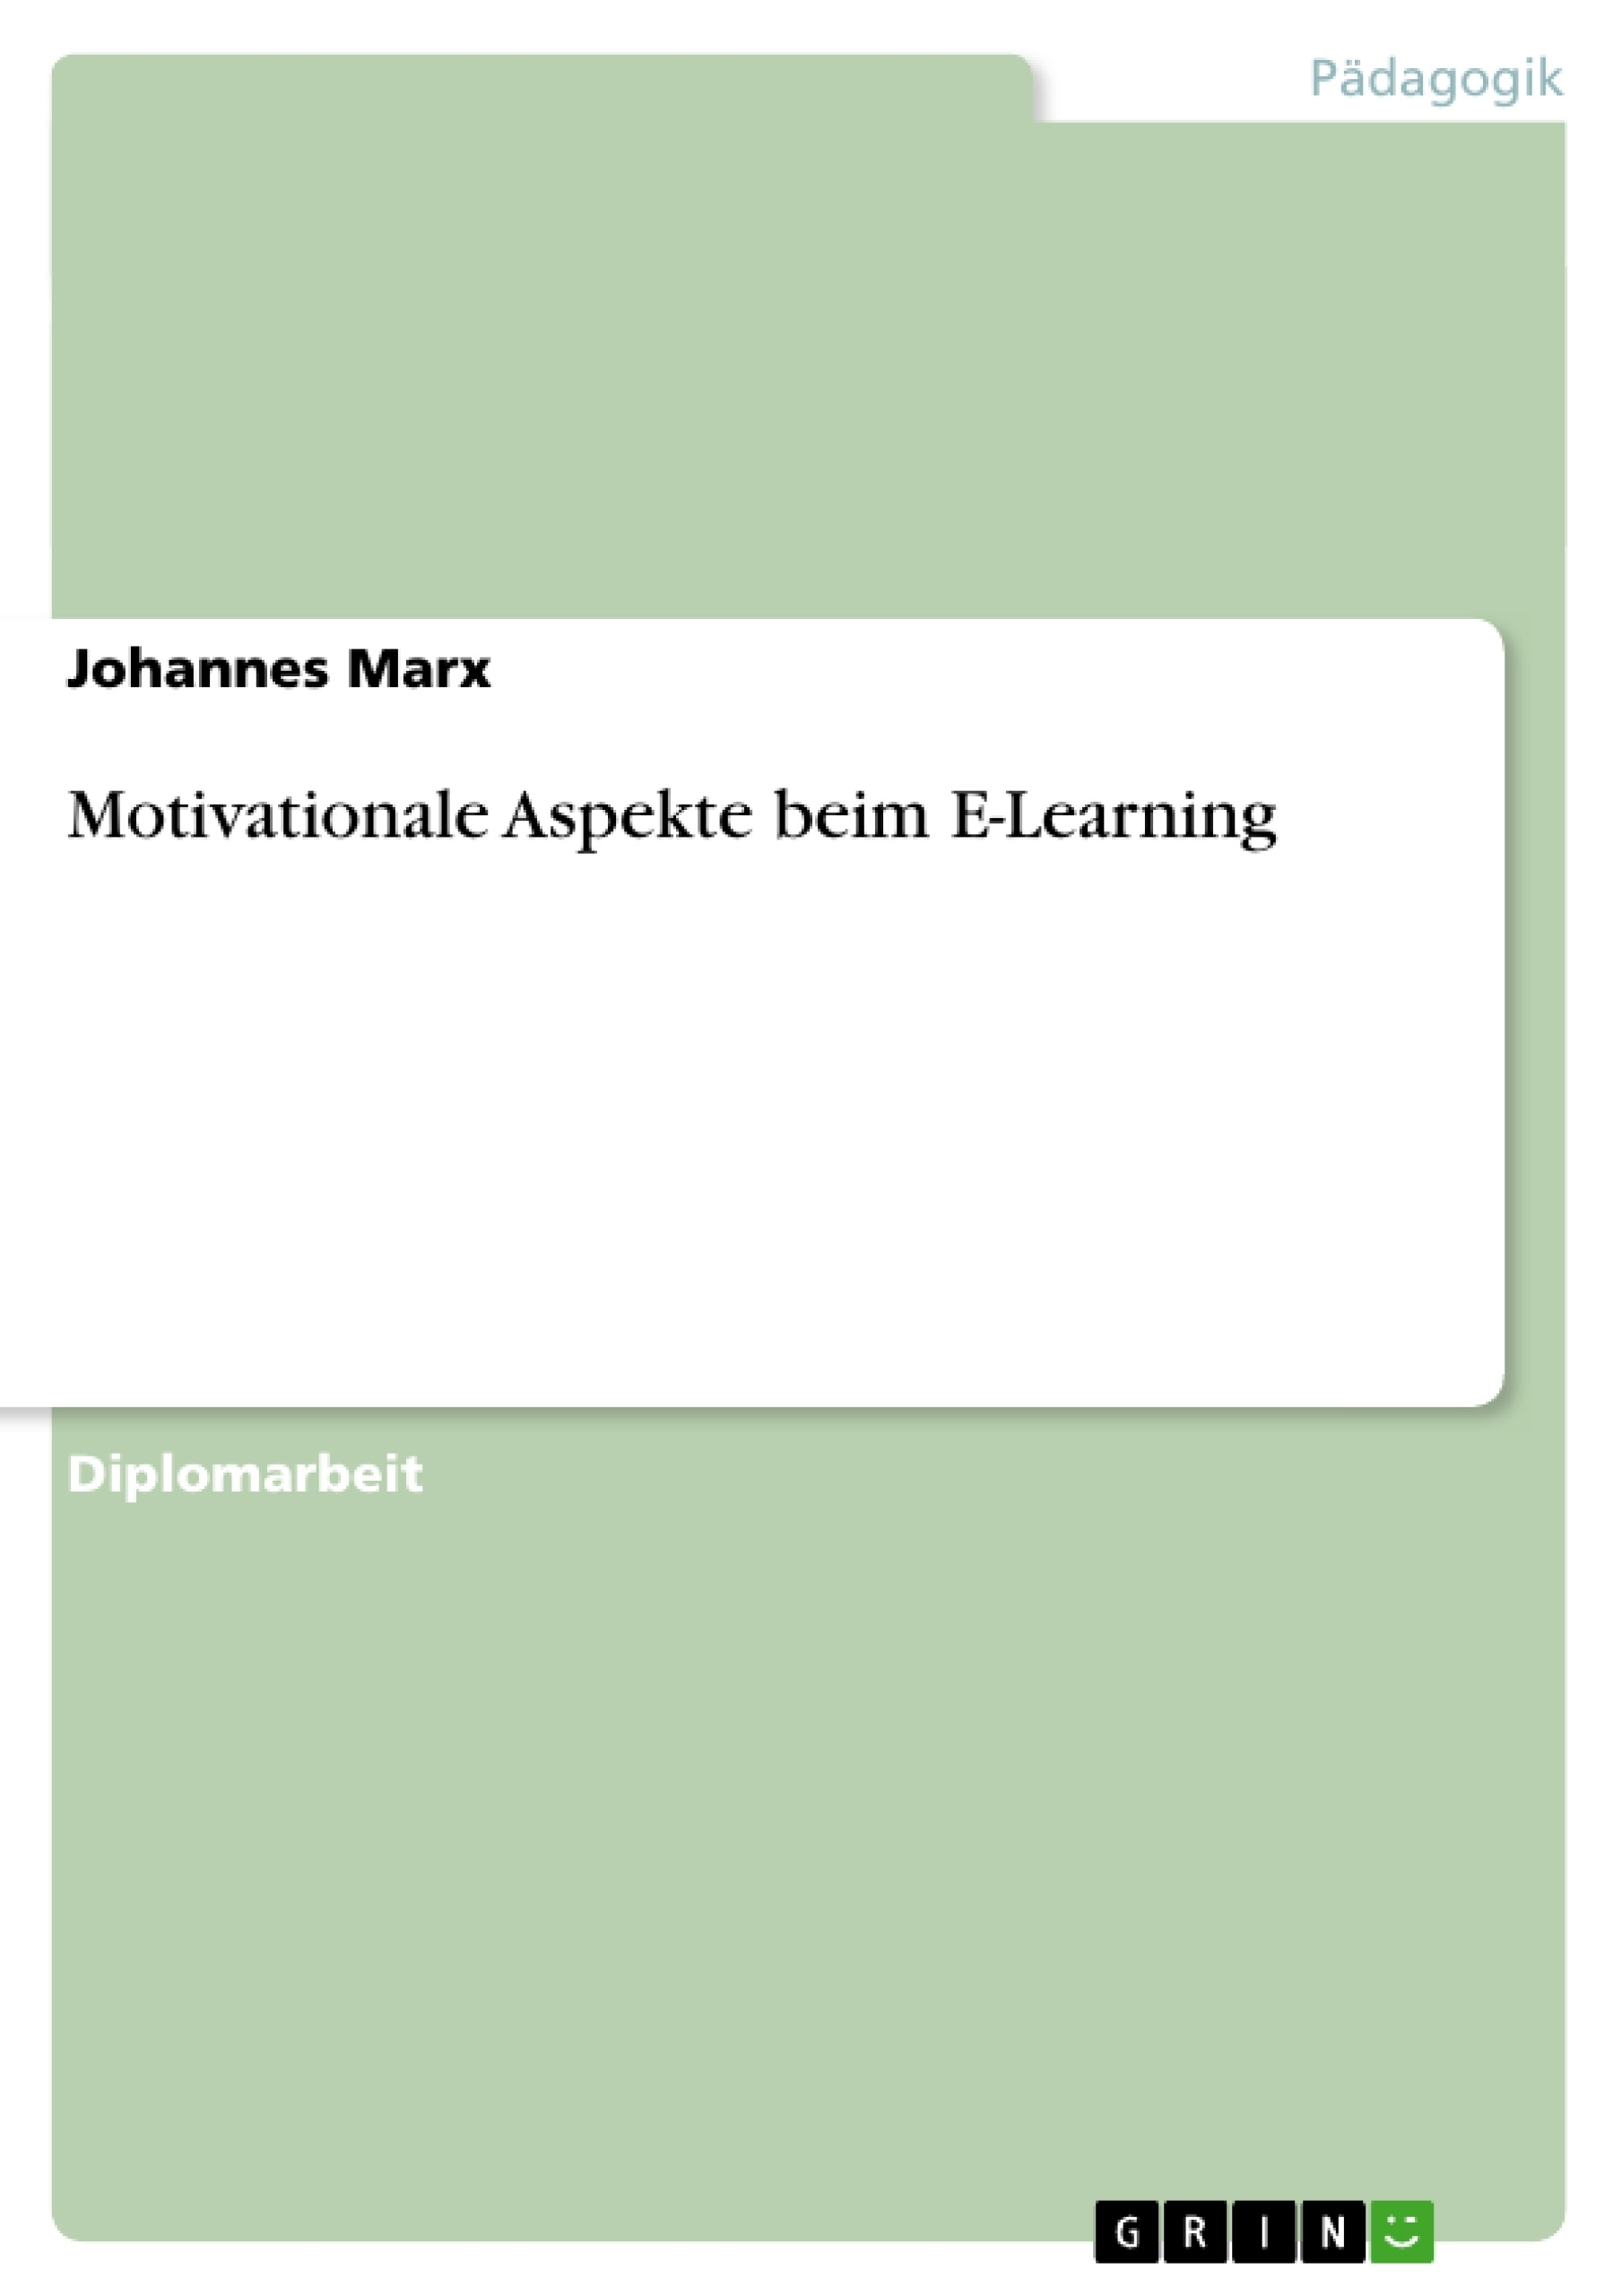 Titel: Motivationale Aspekte beim E-Learning